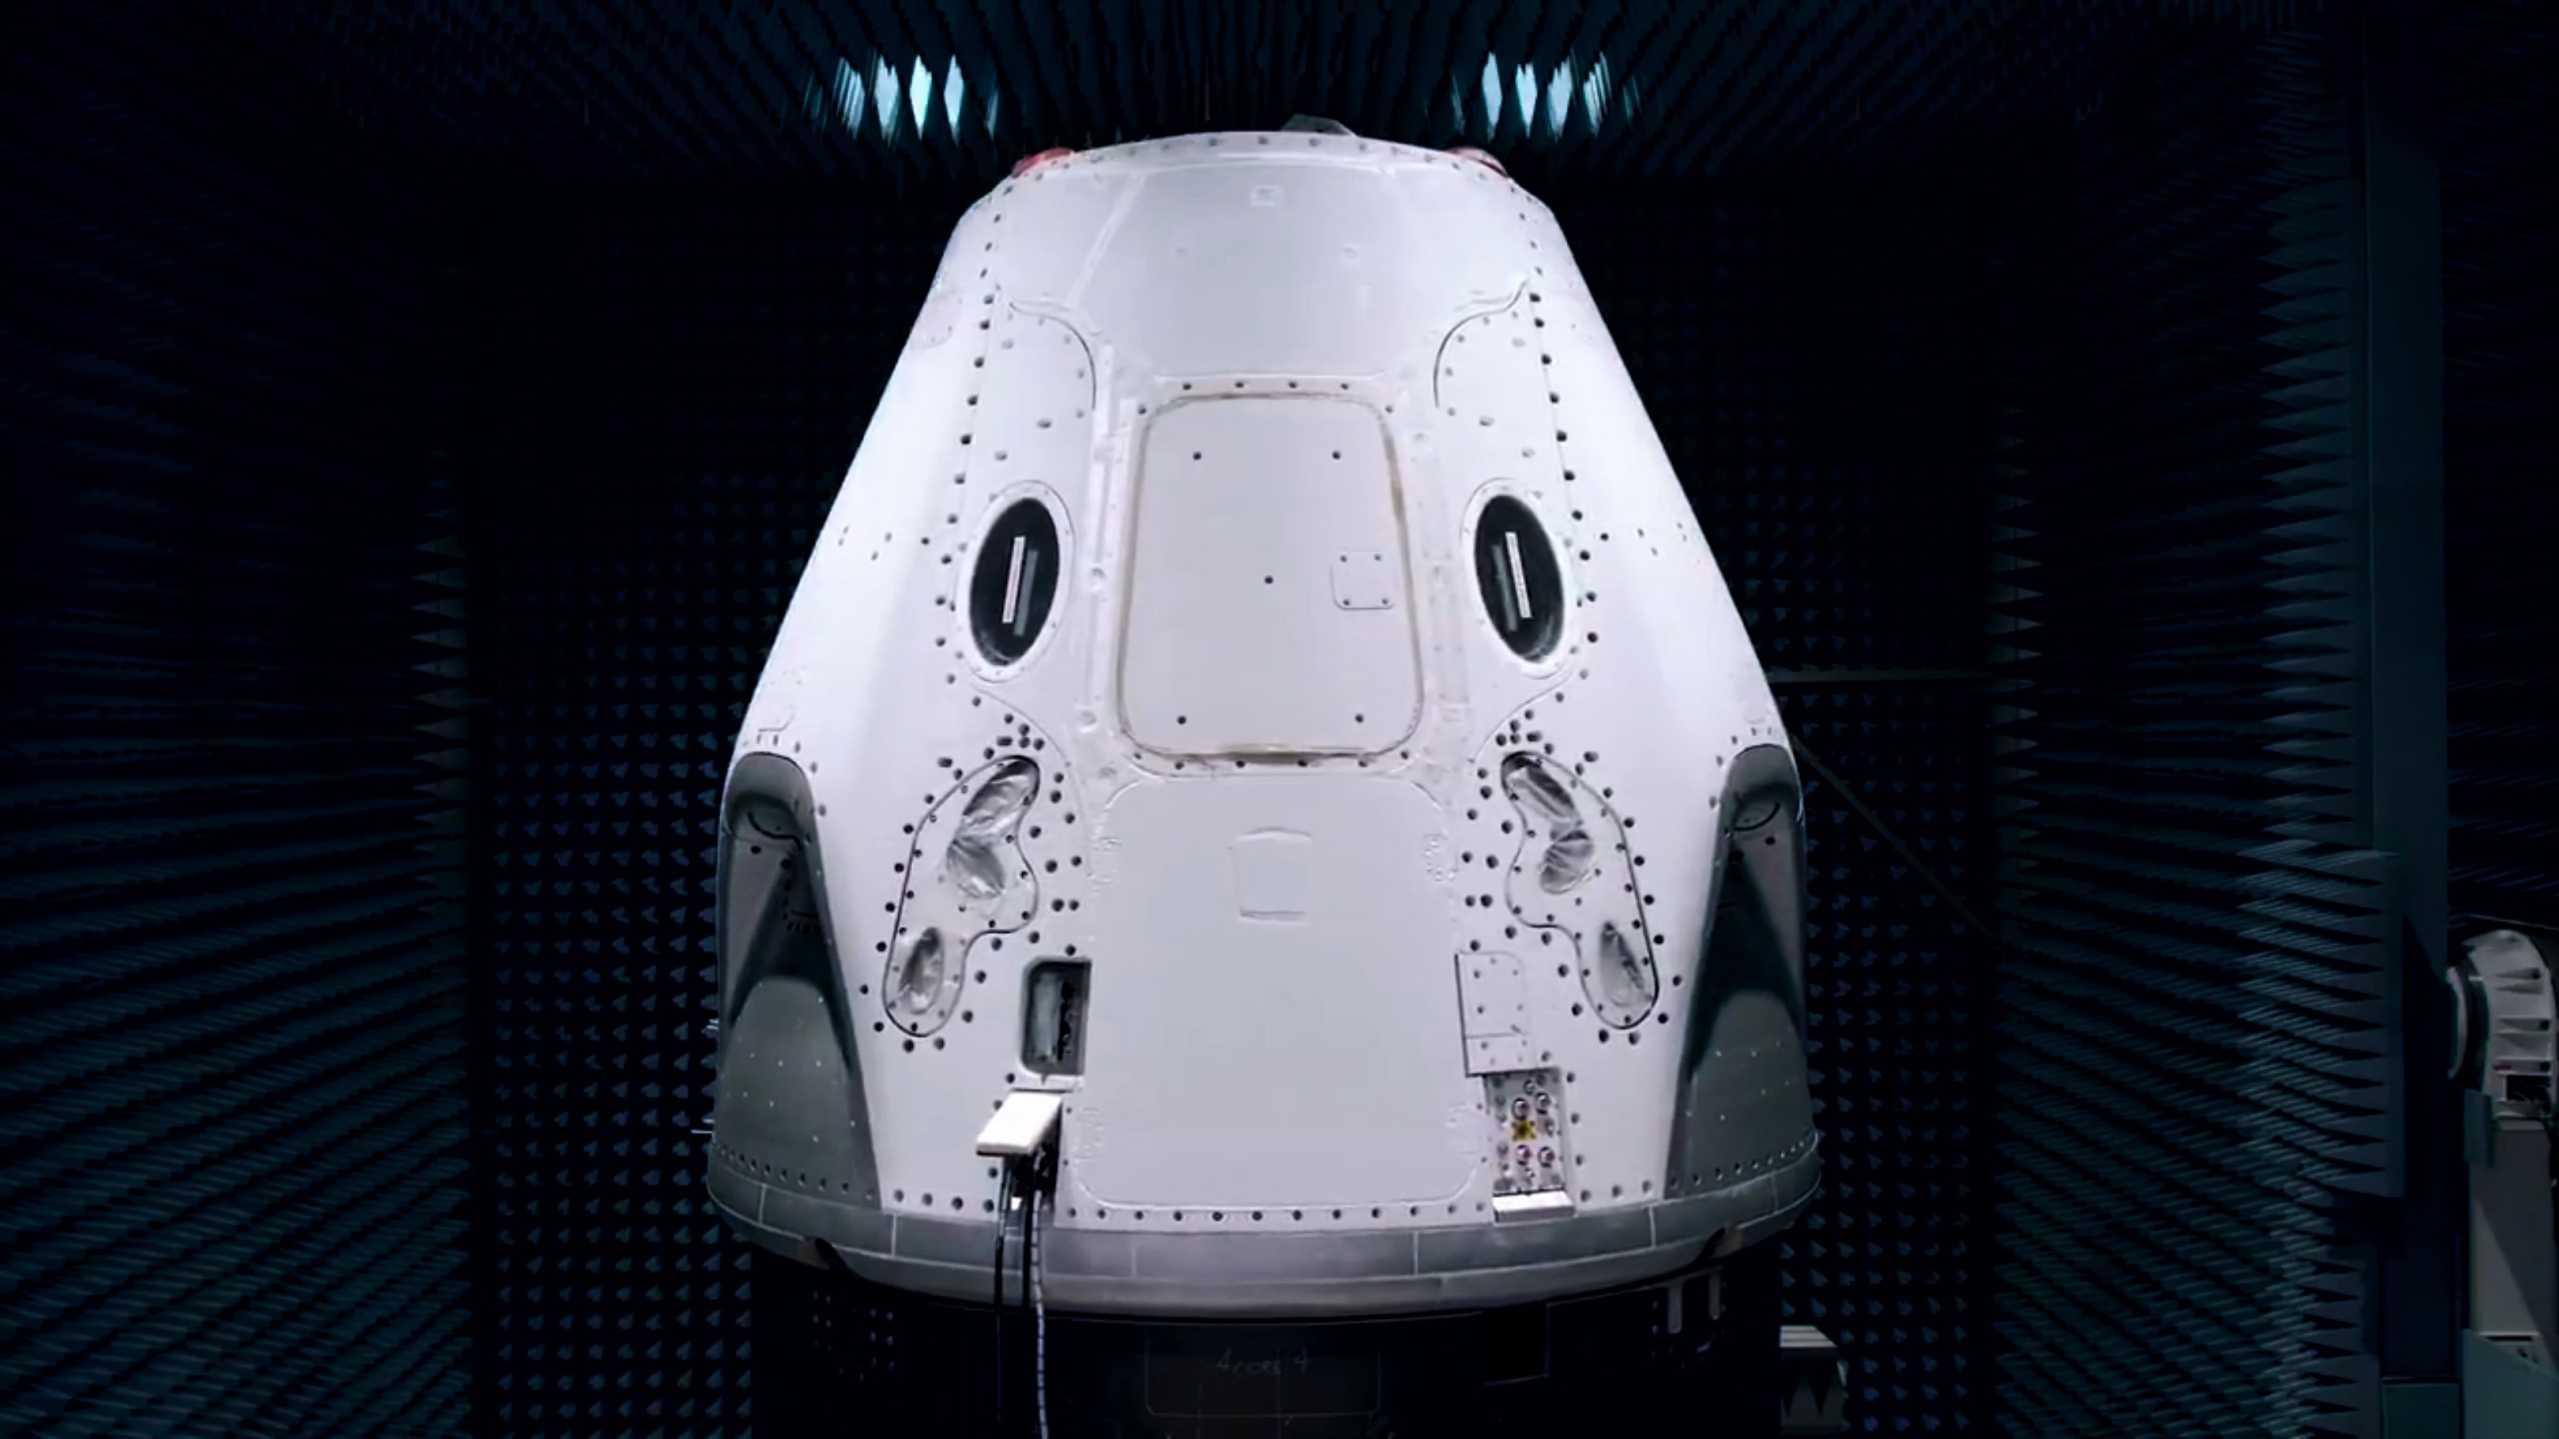 Crew Dragon C206 EMI test Feb 2020 (SpaceX) 4 (c)